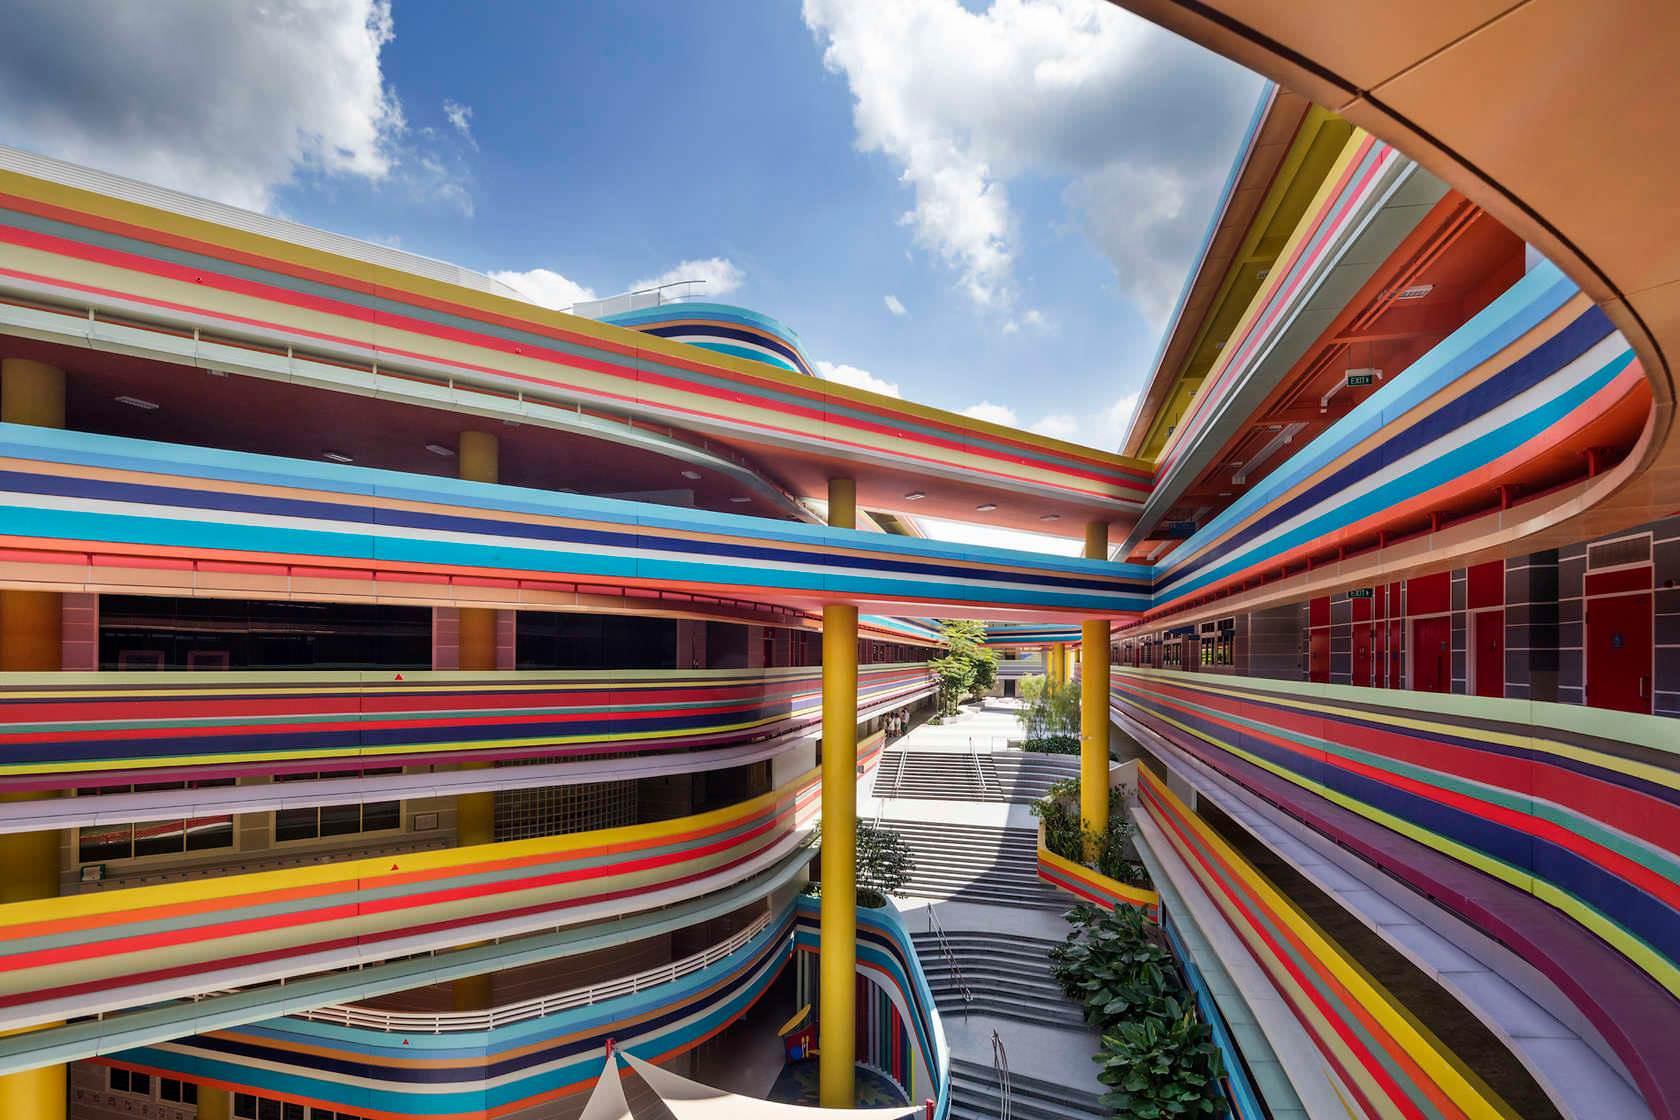 Nanyang Primary School, Singapore – Photo by Rory Daniel, John Gollings